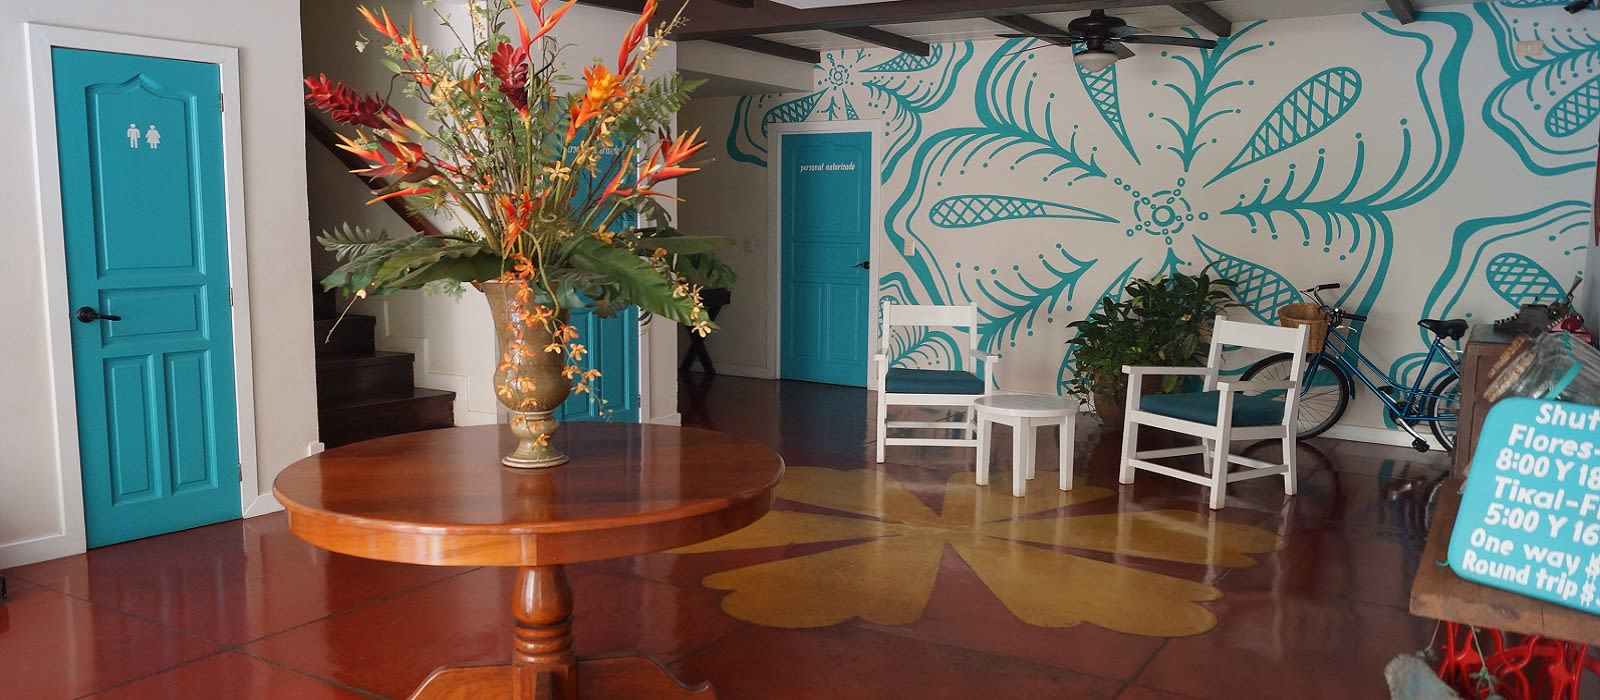 Hotel Isla de Flores Guatemala